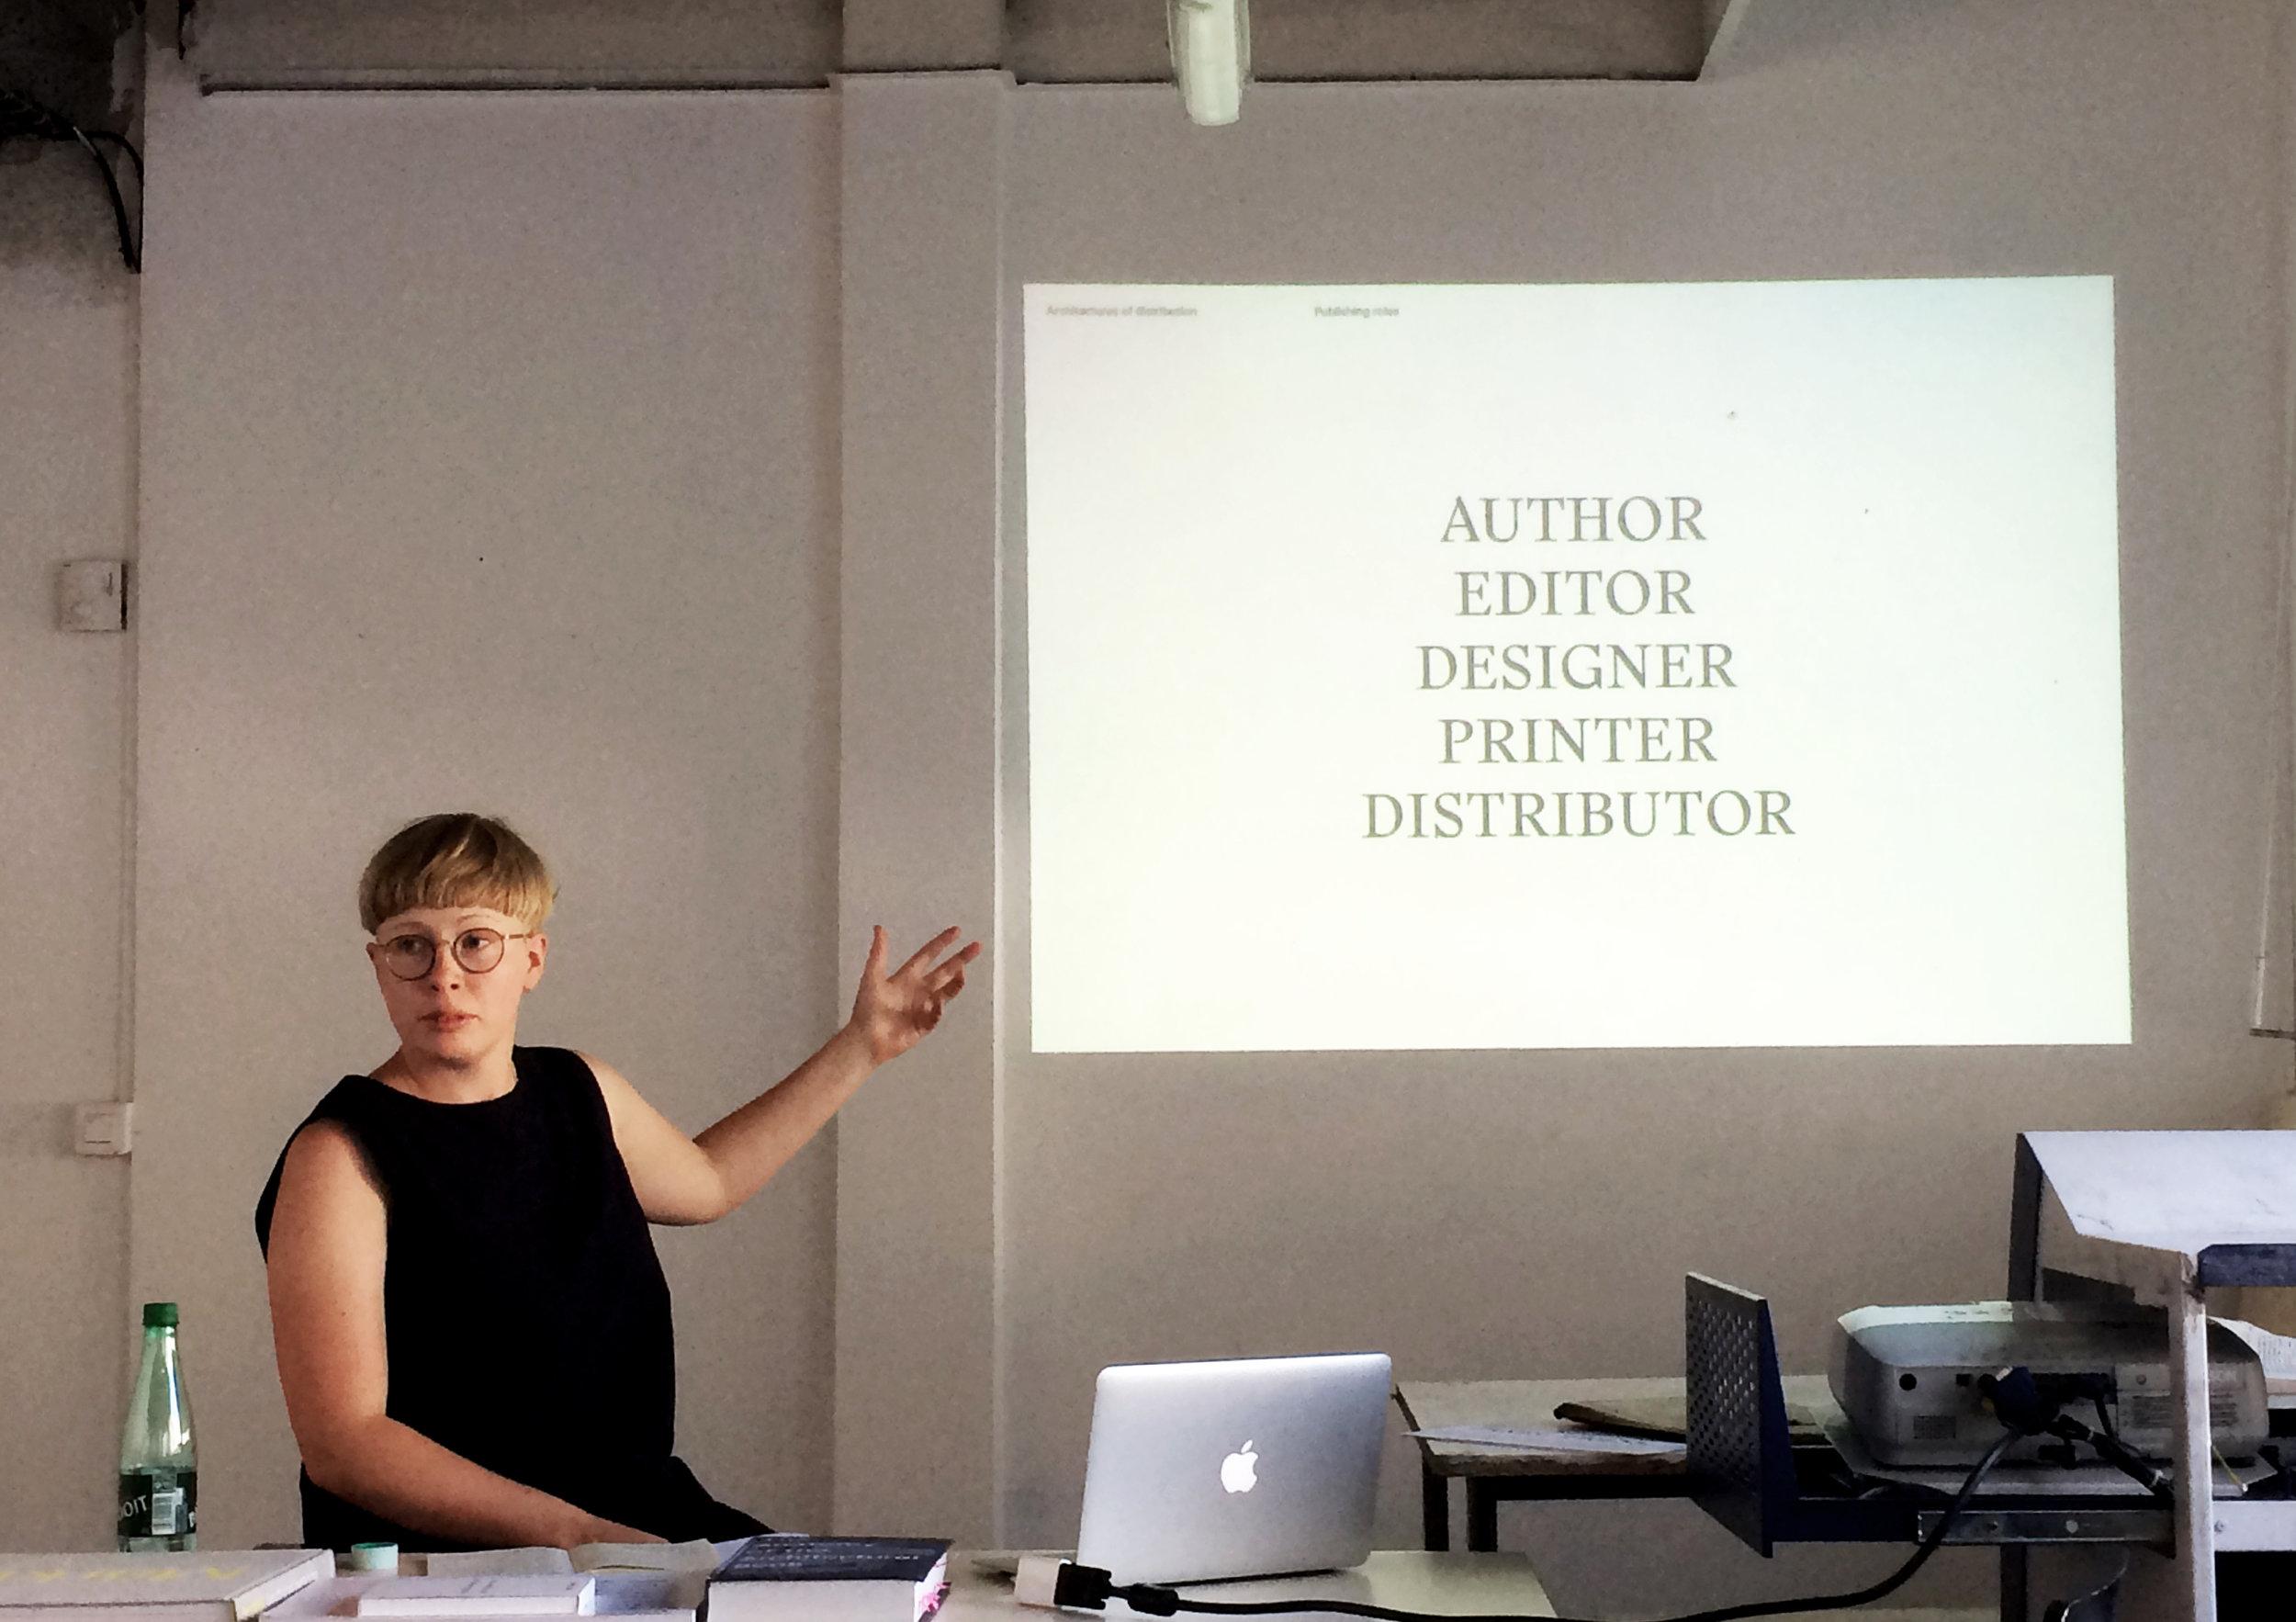 Rosa Nussbaum presentation